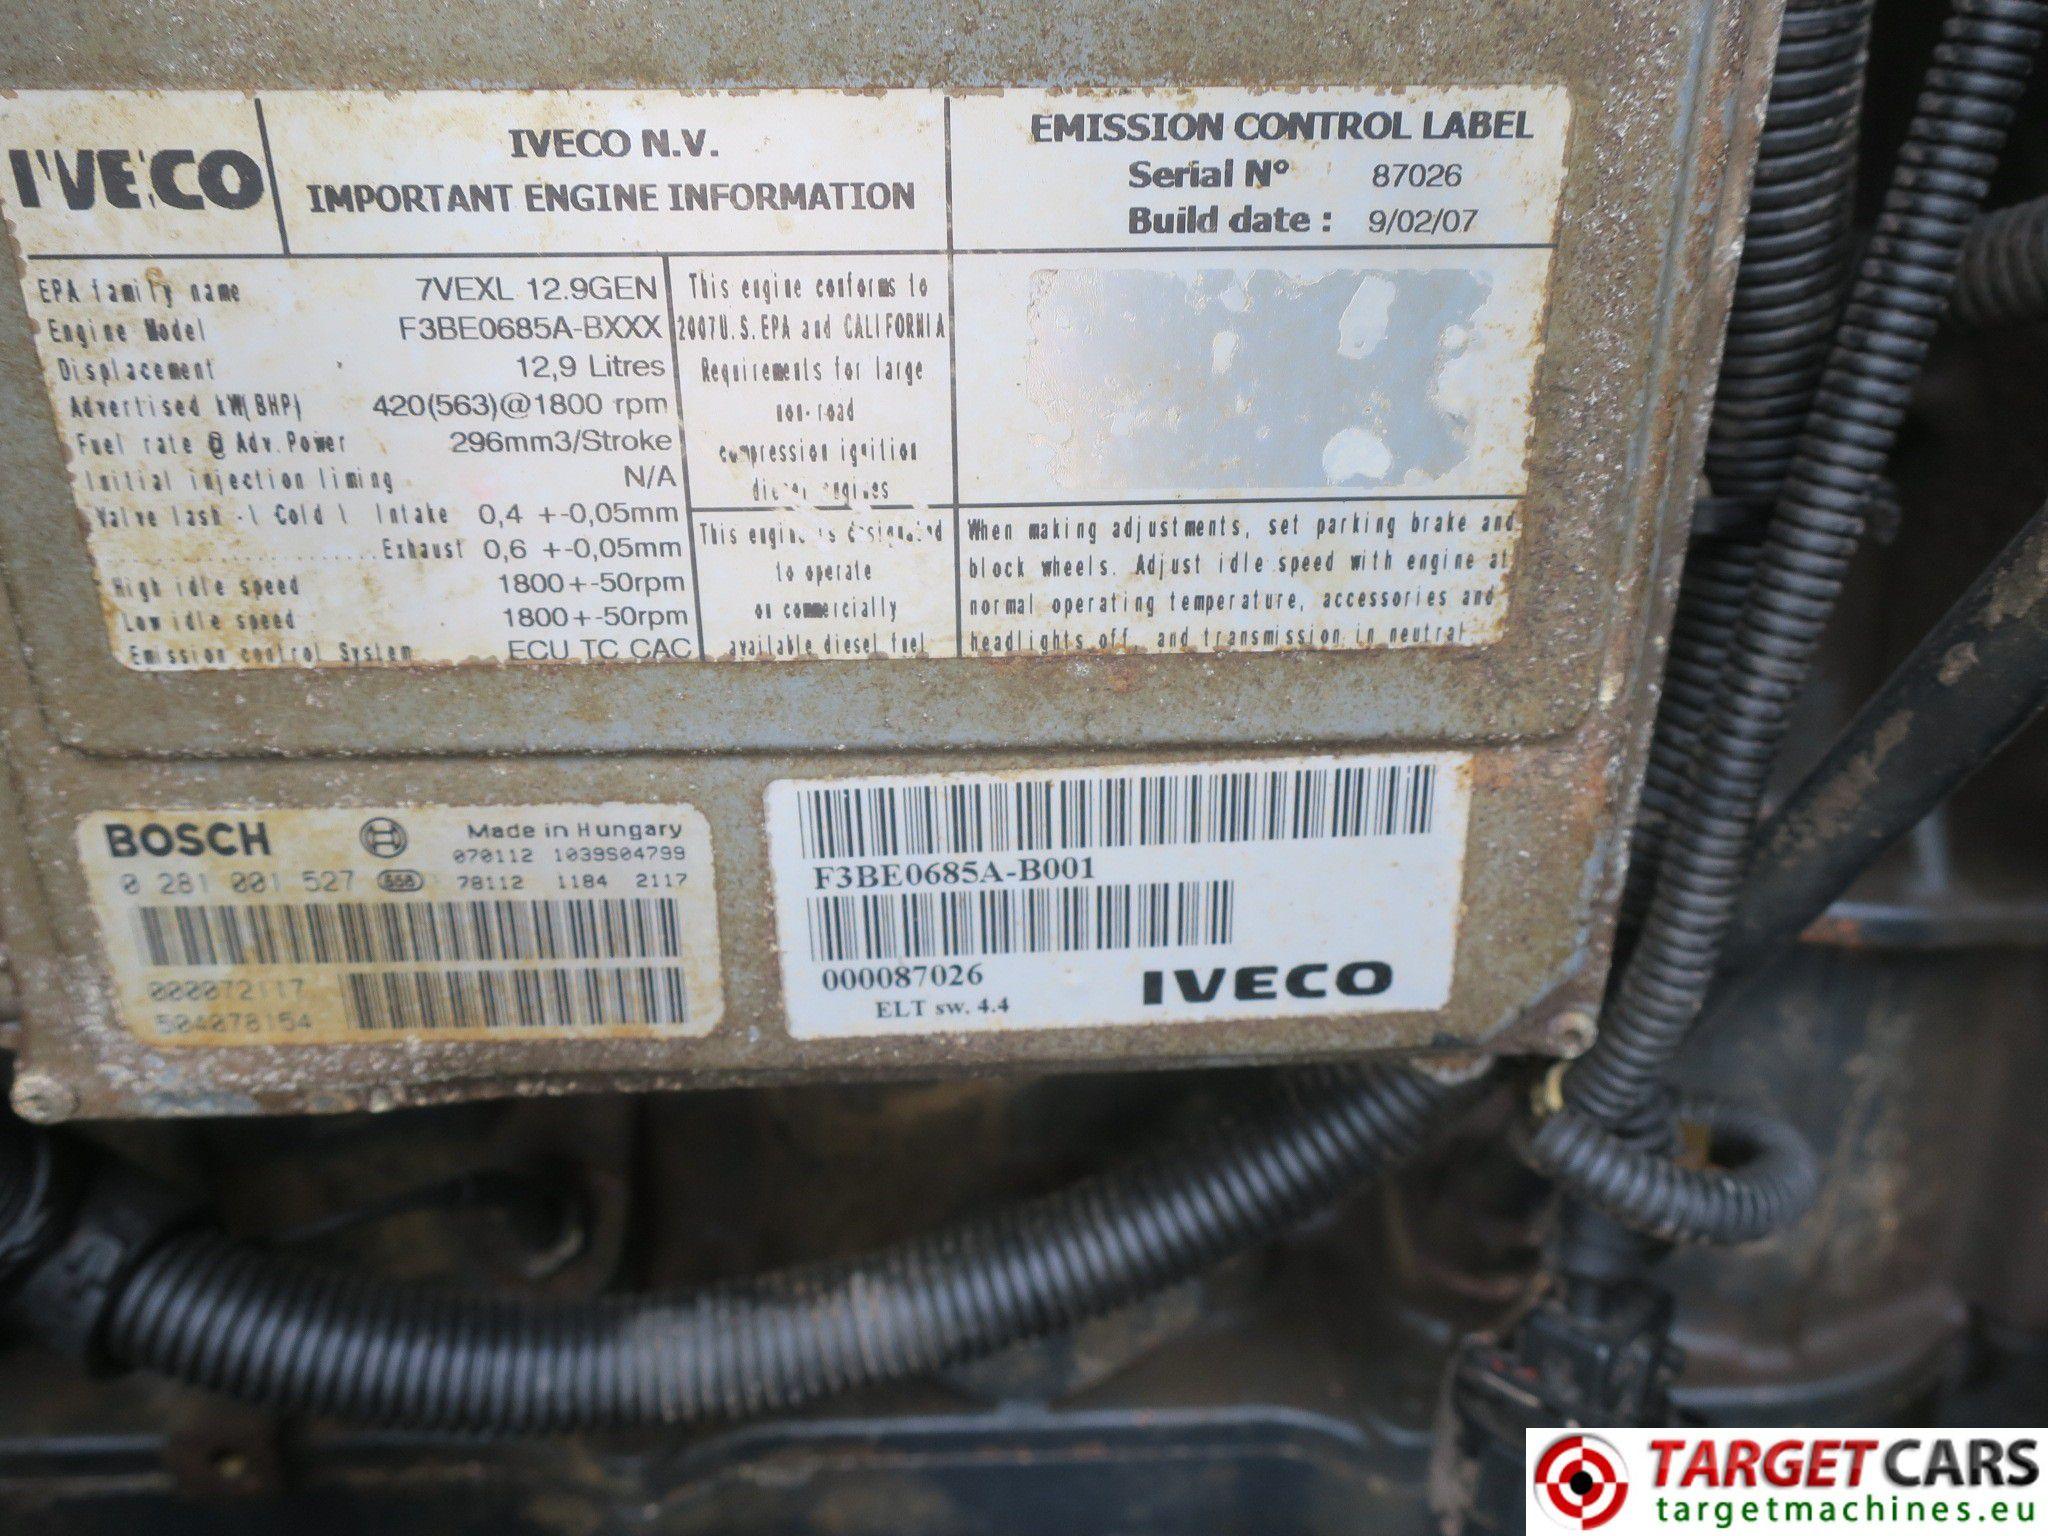 HIMOINSA HFW-400 DIESEL 400KVA GENERATOR SET IVECO 2007 7103228